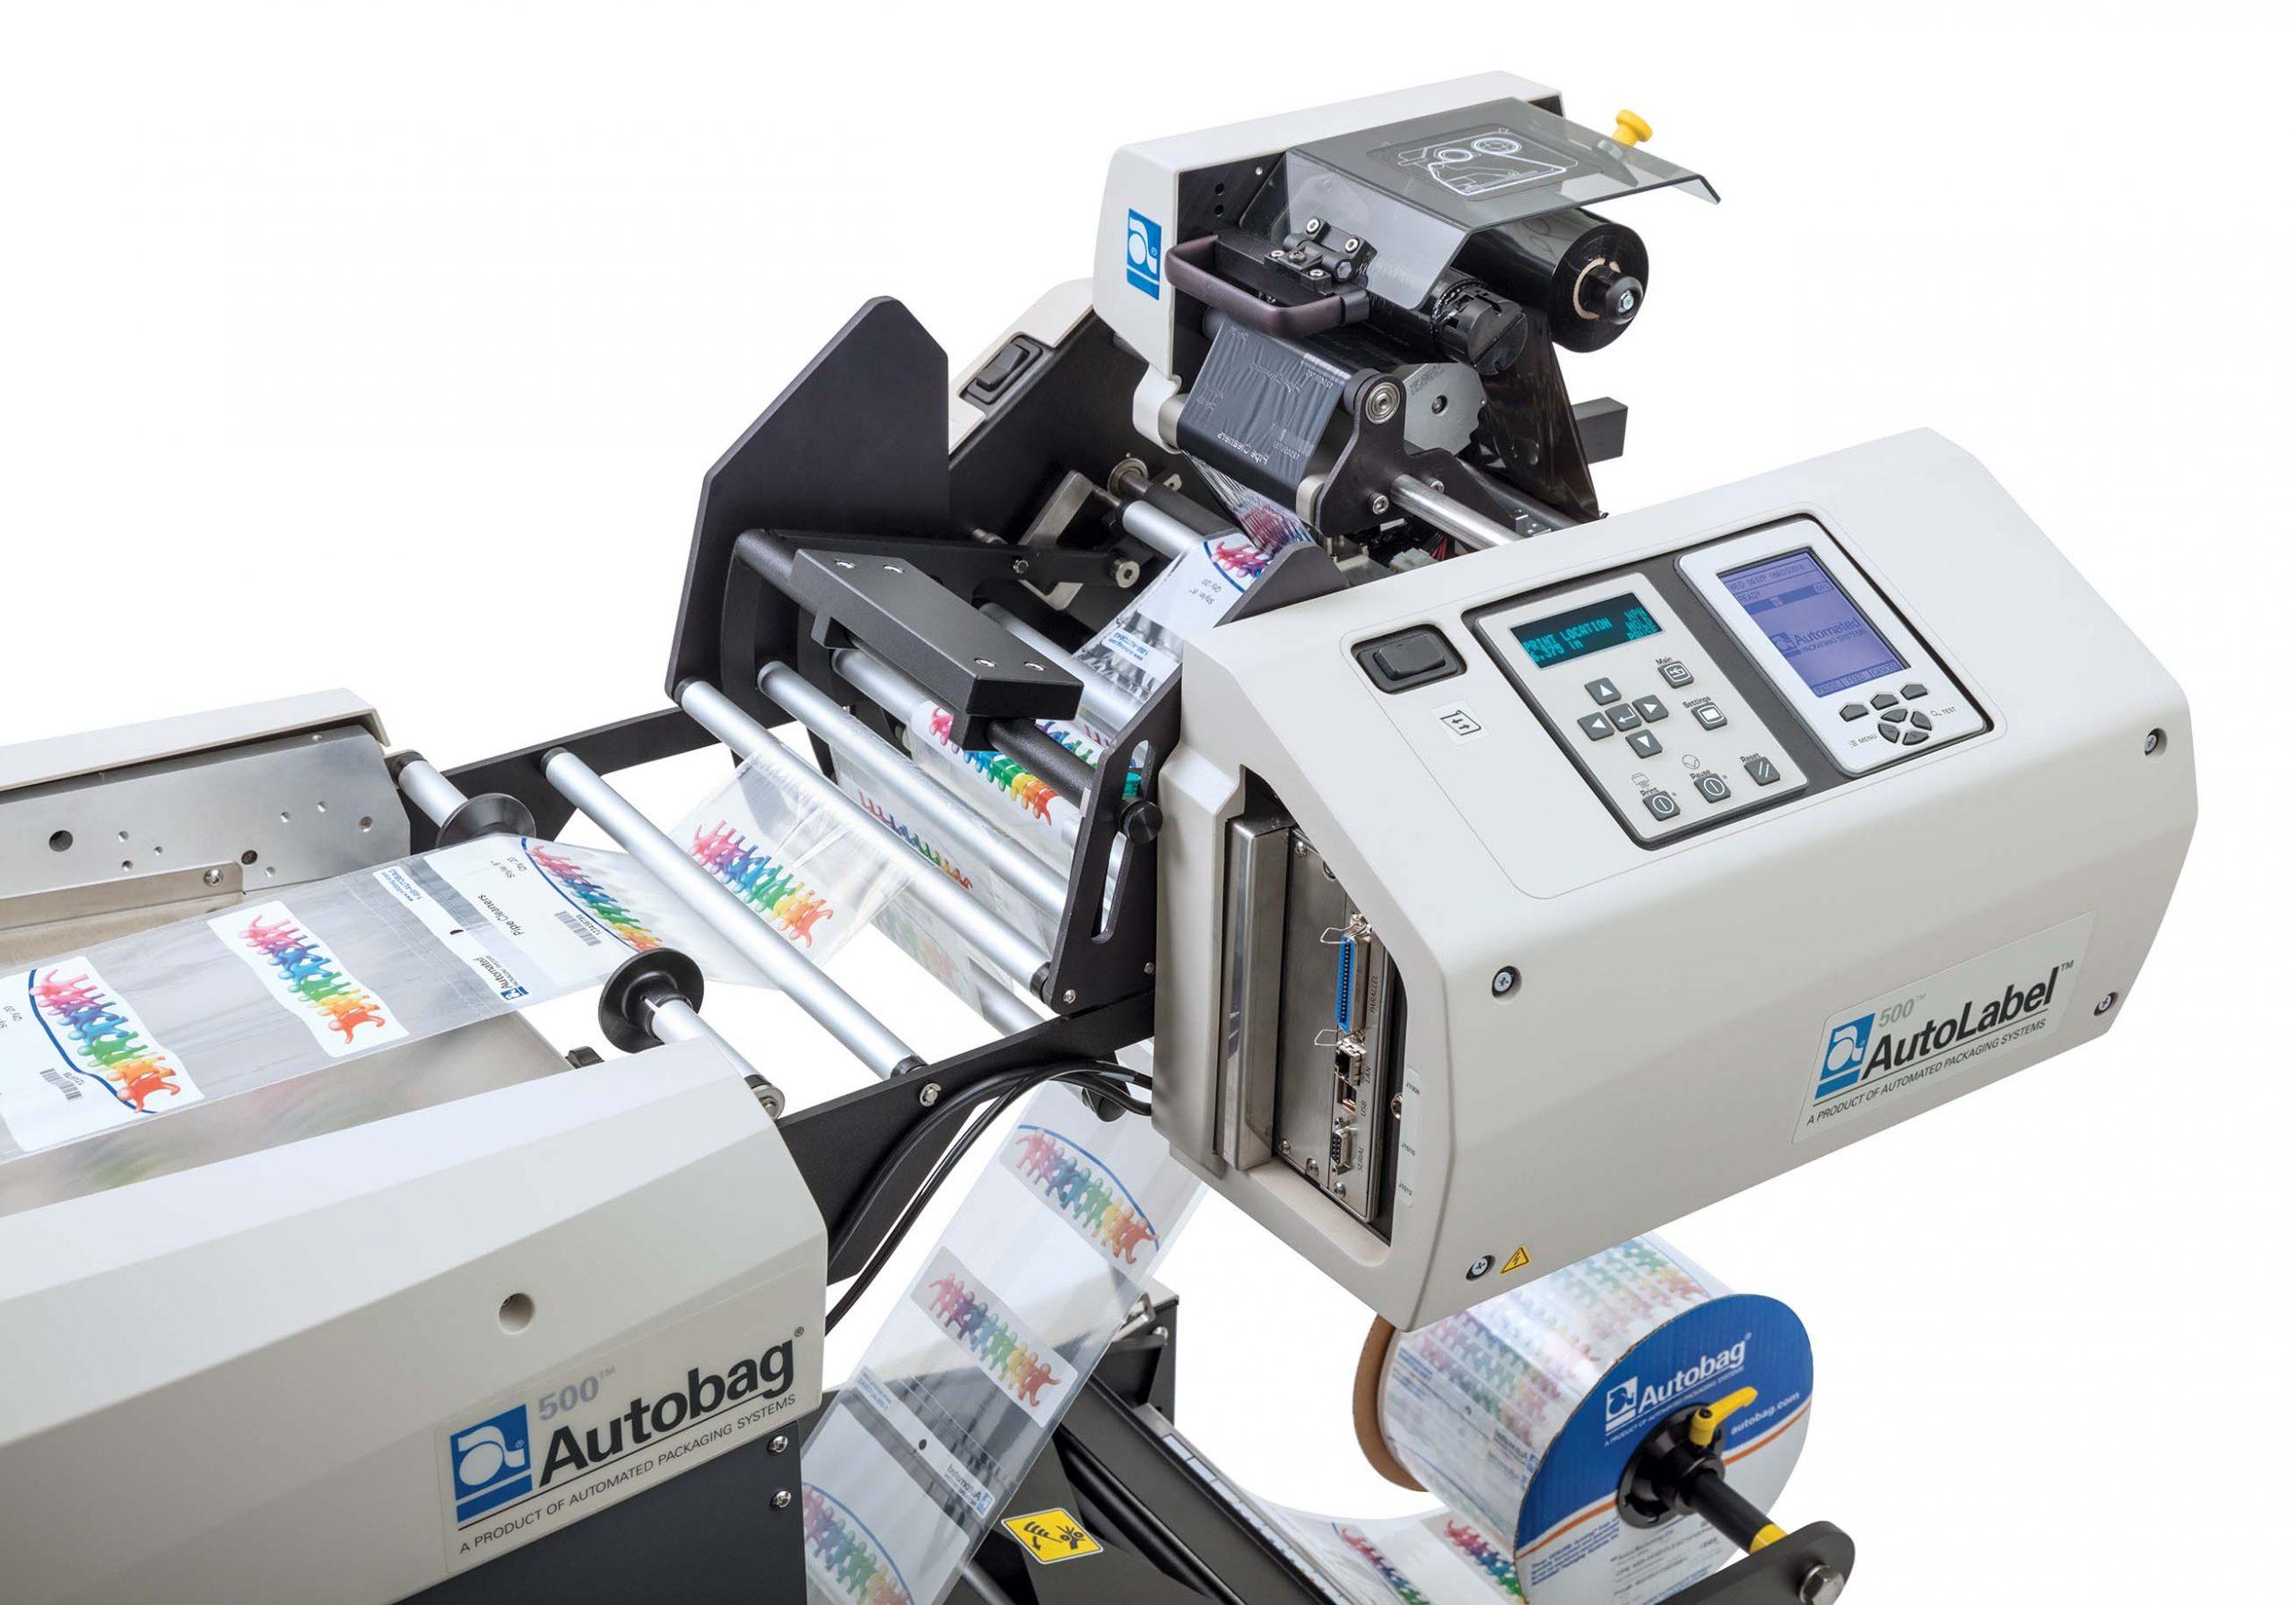 AutoLabel 500 Thermal Transfer Printer